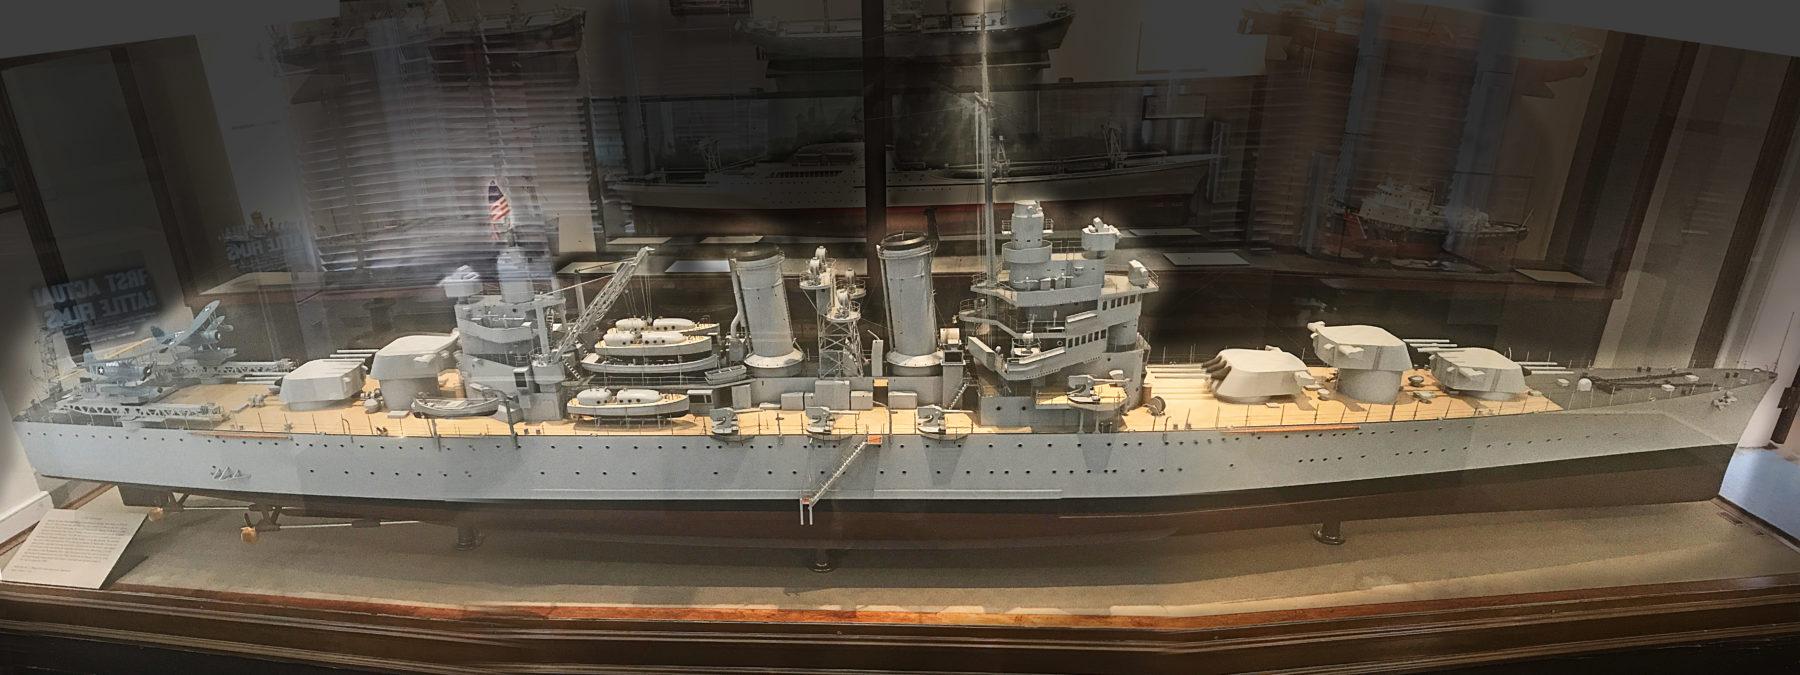 shipyard model of the Savannah